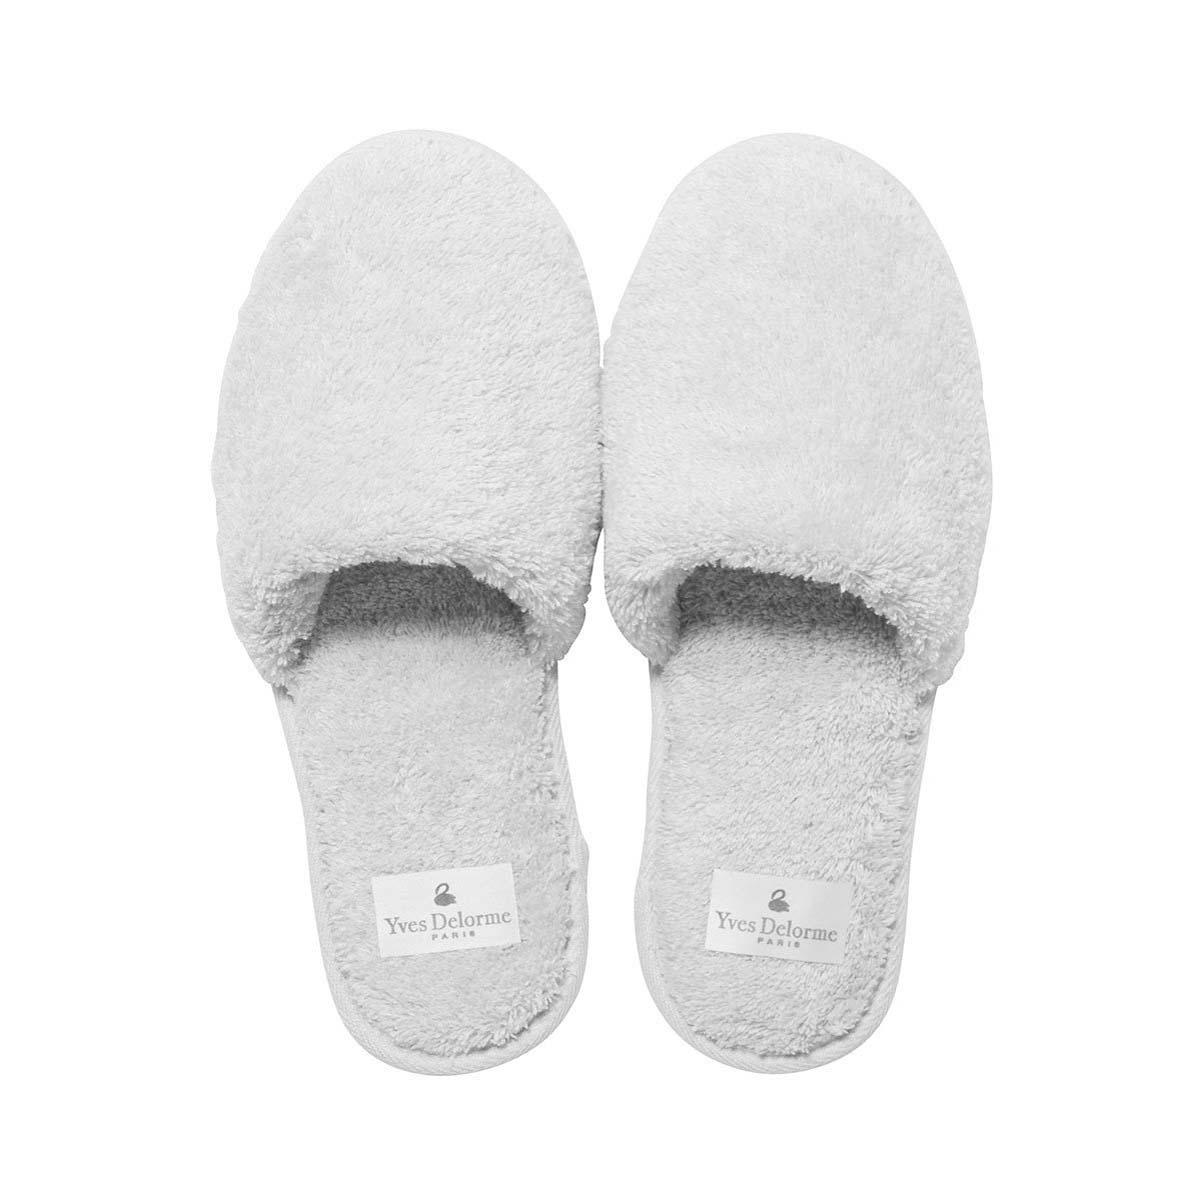 3fa570c576 Yves Delorme - Etoile Men s Slippers